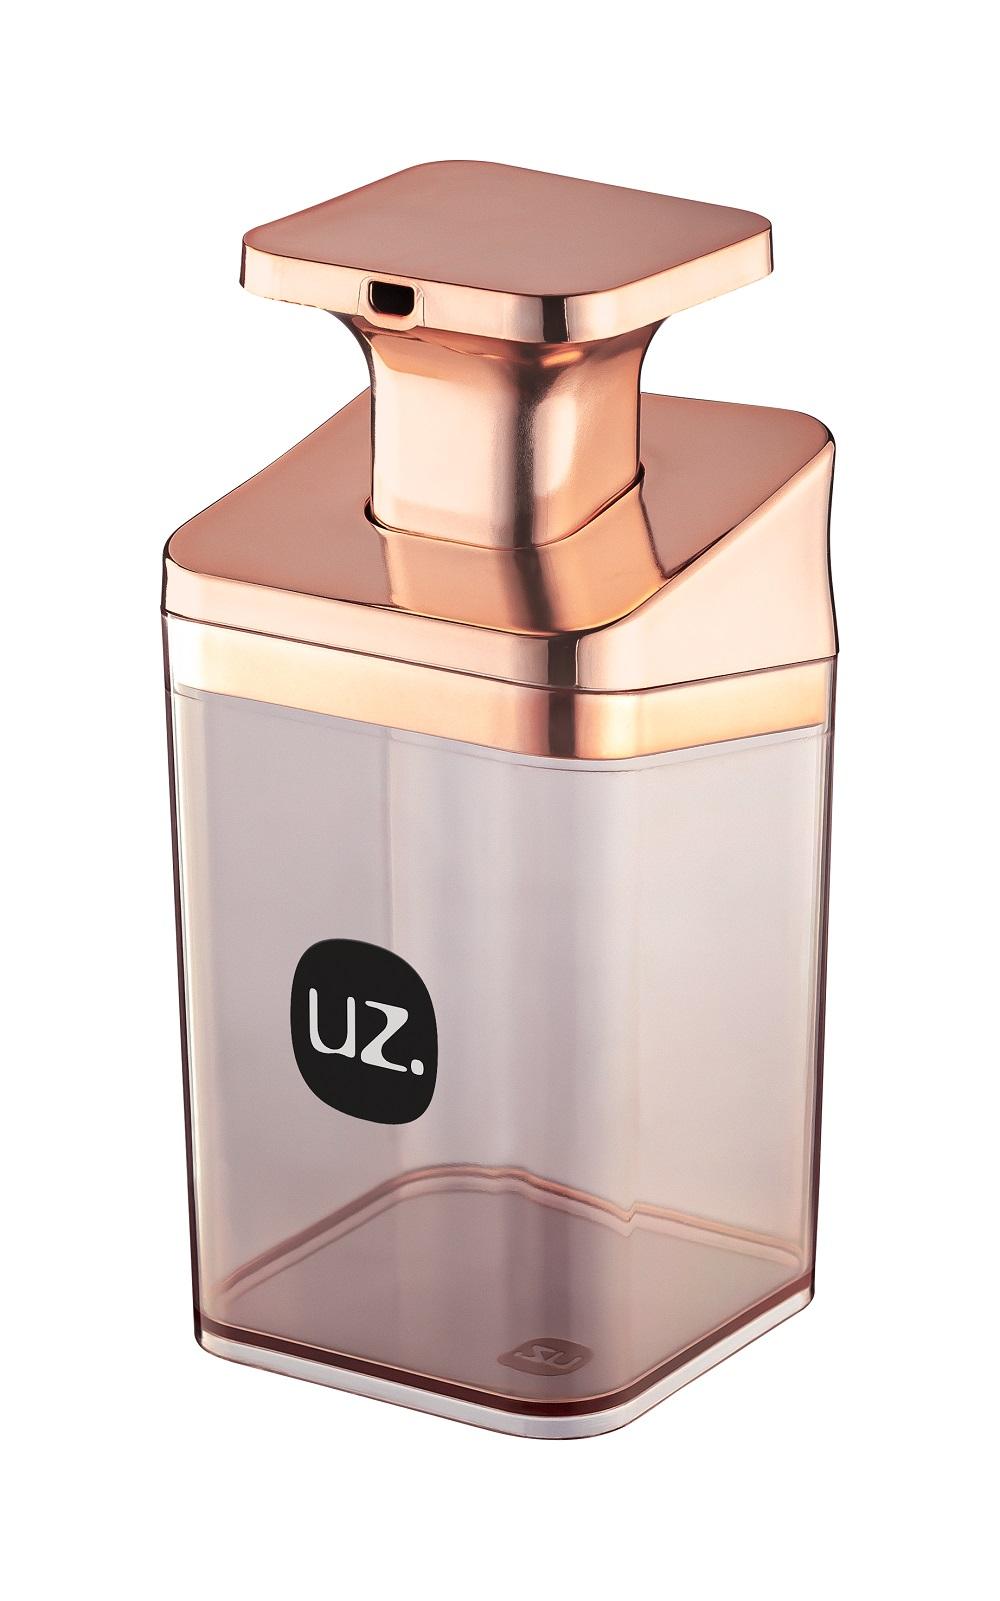 Porta Sabonete Líquido Slim Metalizado de Plástico - UZ